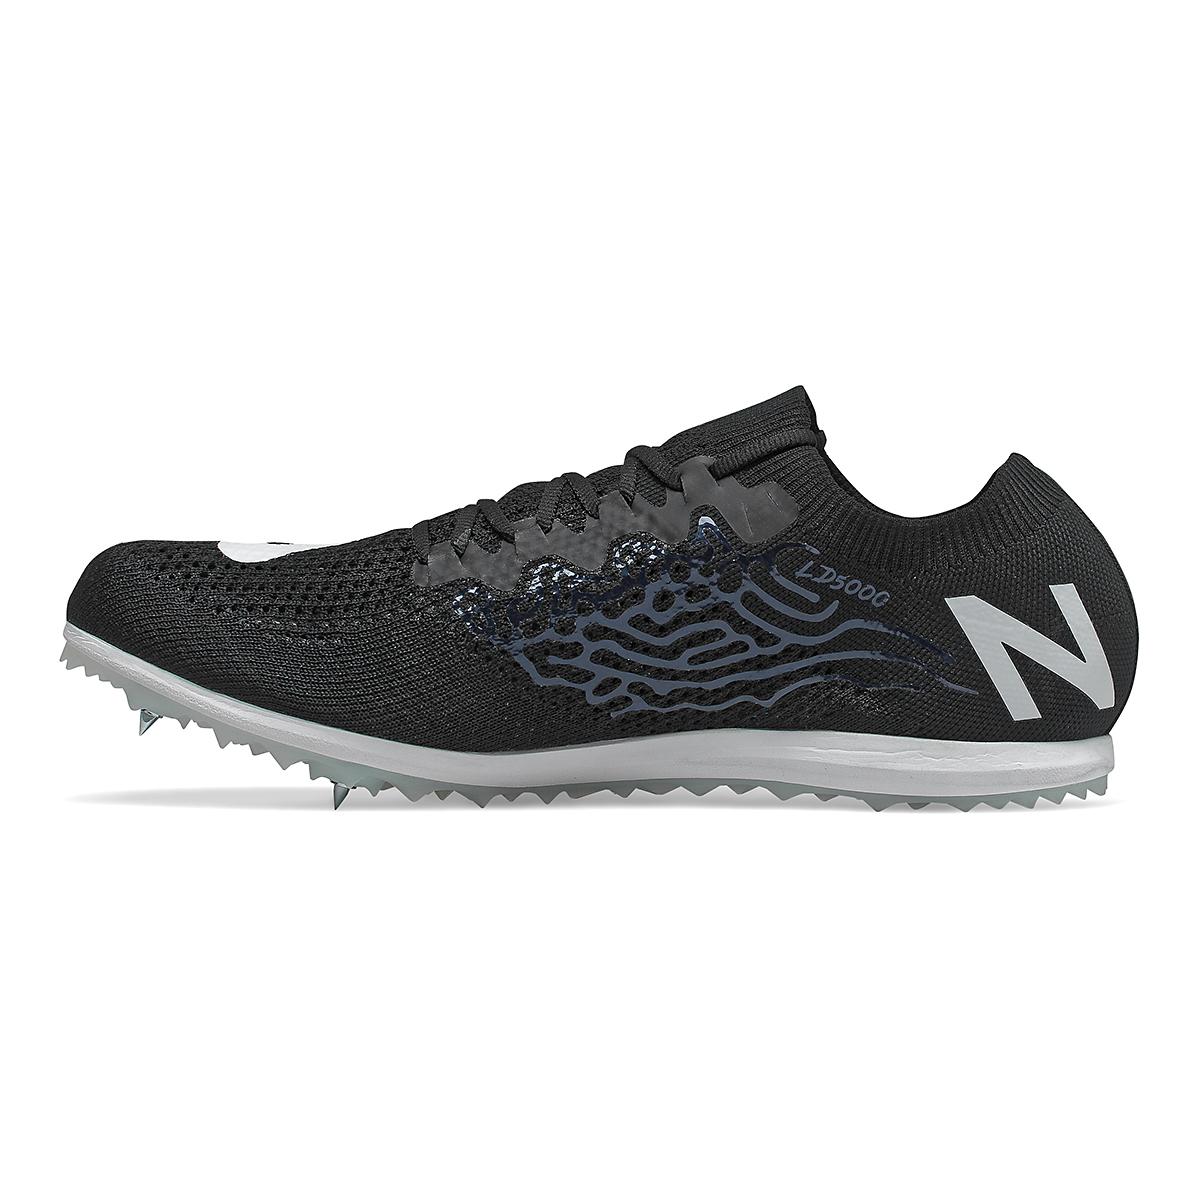 Men's New Balance LD5Kv8 Track Spikes - Color: Black/White - Size: 8 - Width: Regular, Black/White, large, image 2